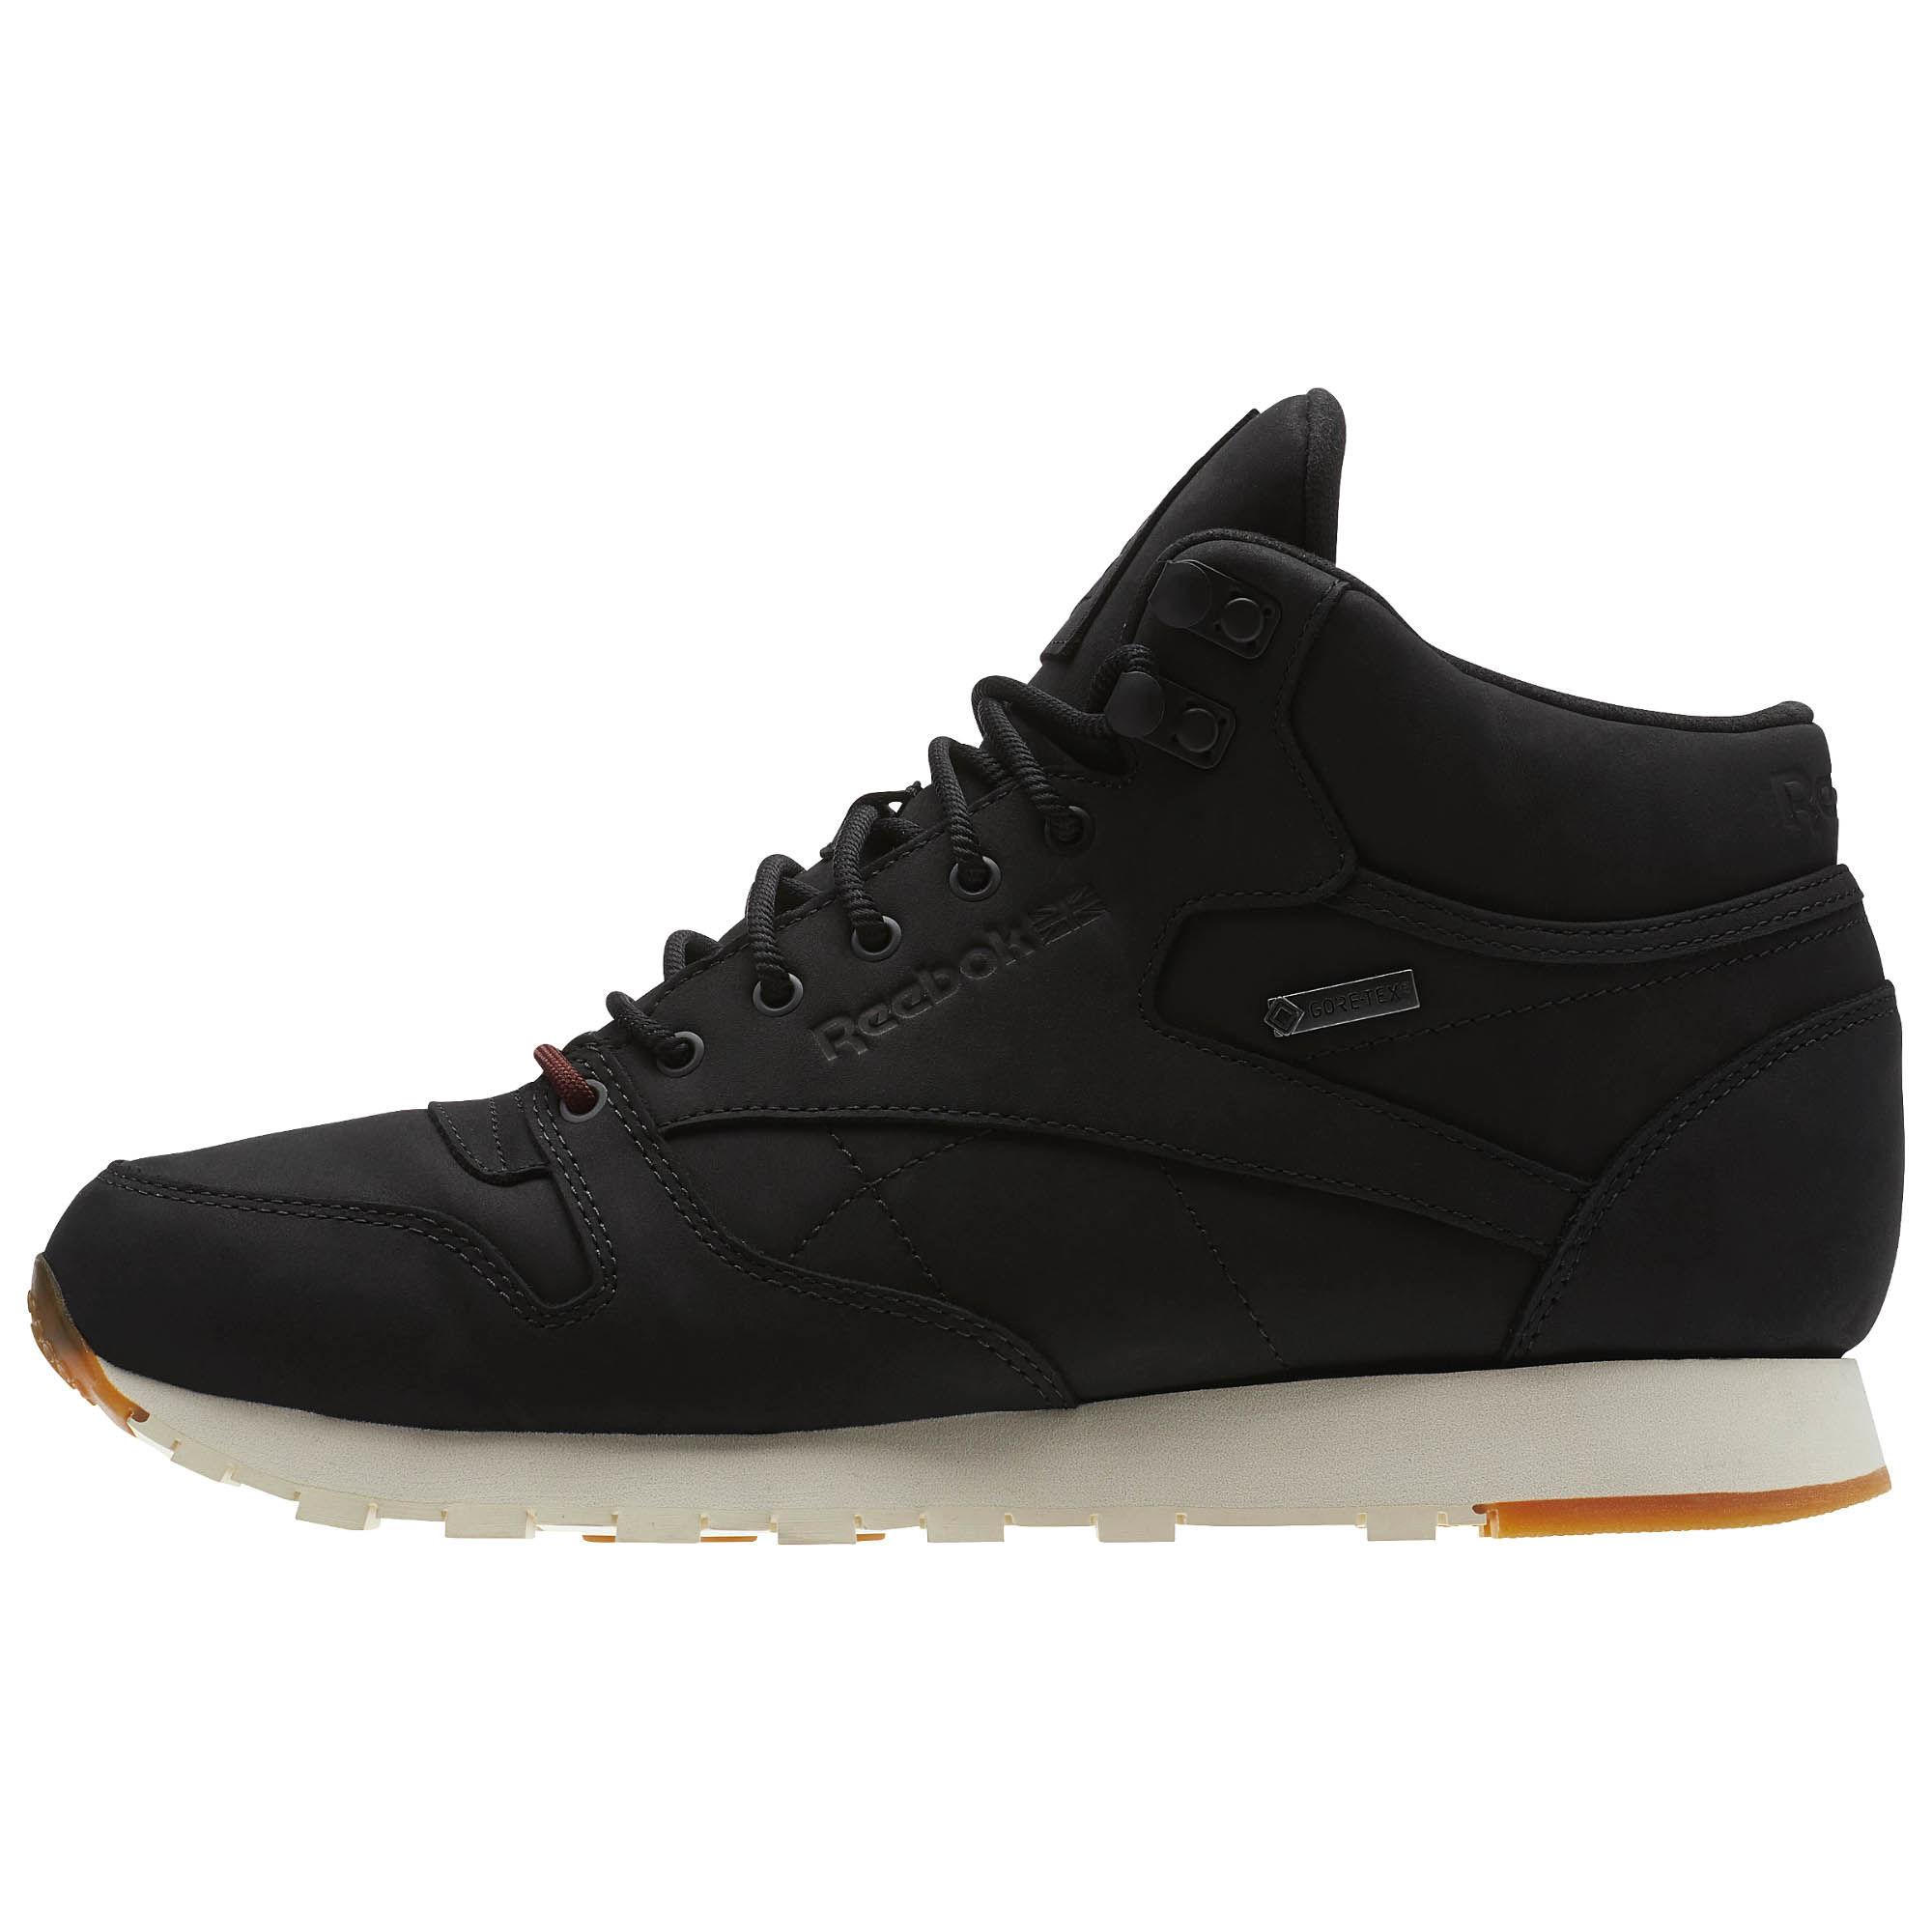 14e0cd67cda7 reebok classic leather mid gore-tex thinsulate black 2 - WearTesters